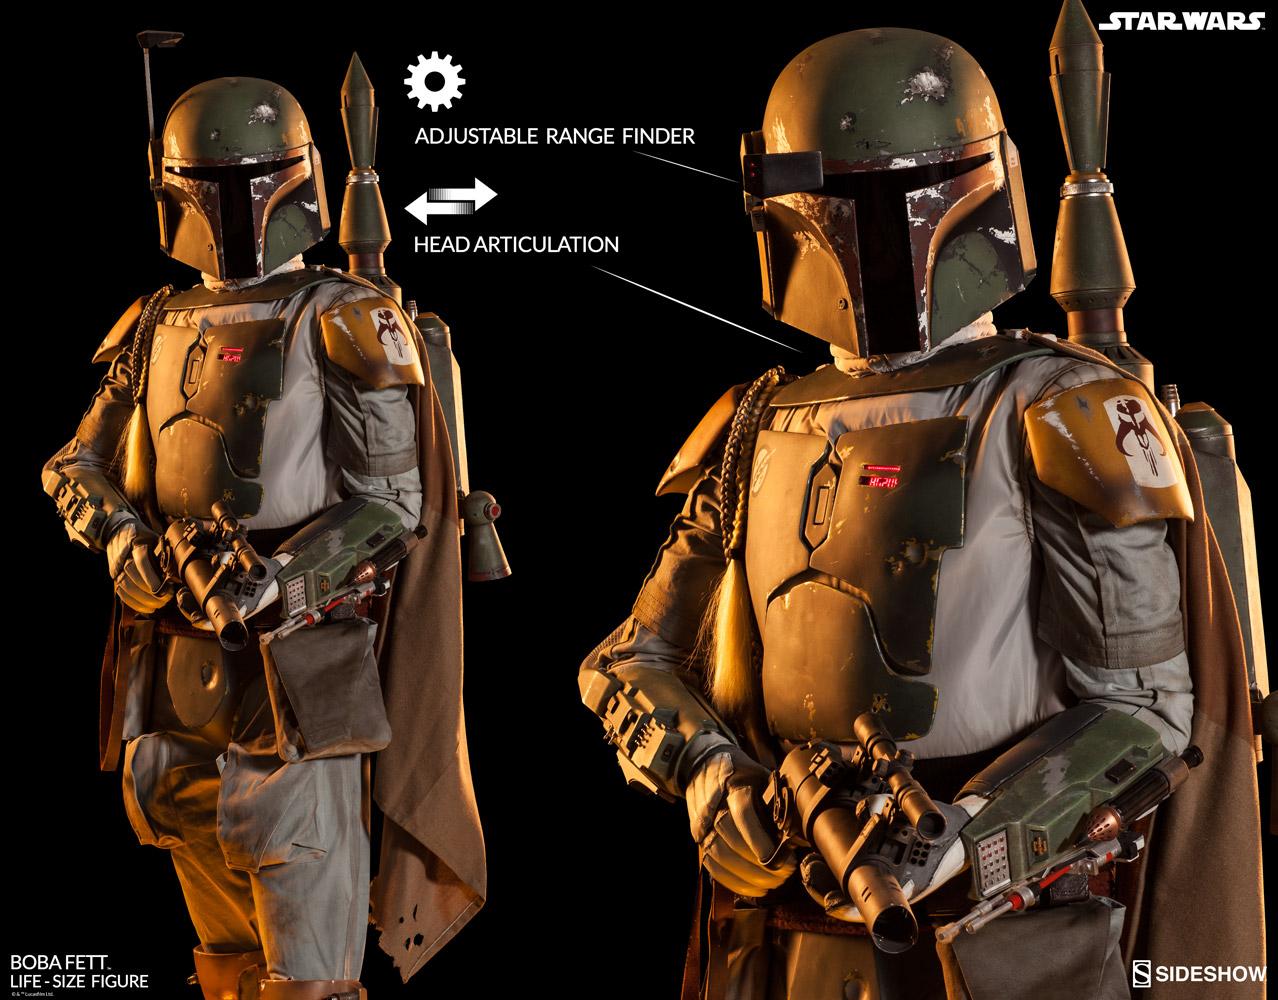 star-wars-boba-fett-life-size-figure-400301-06.jpg